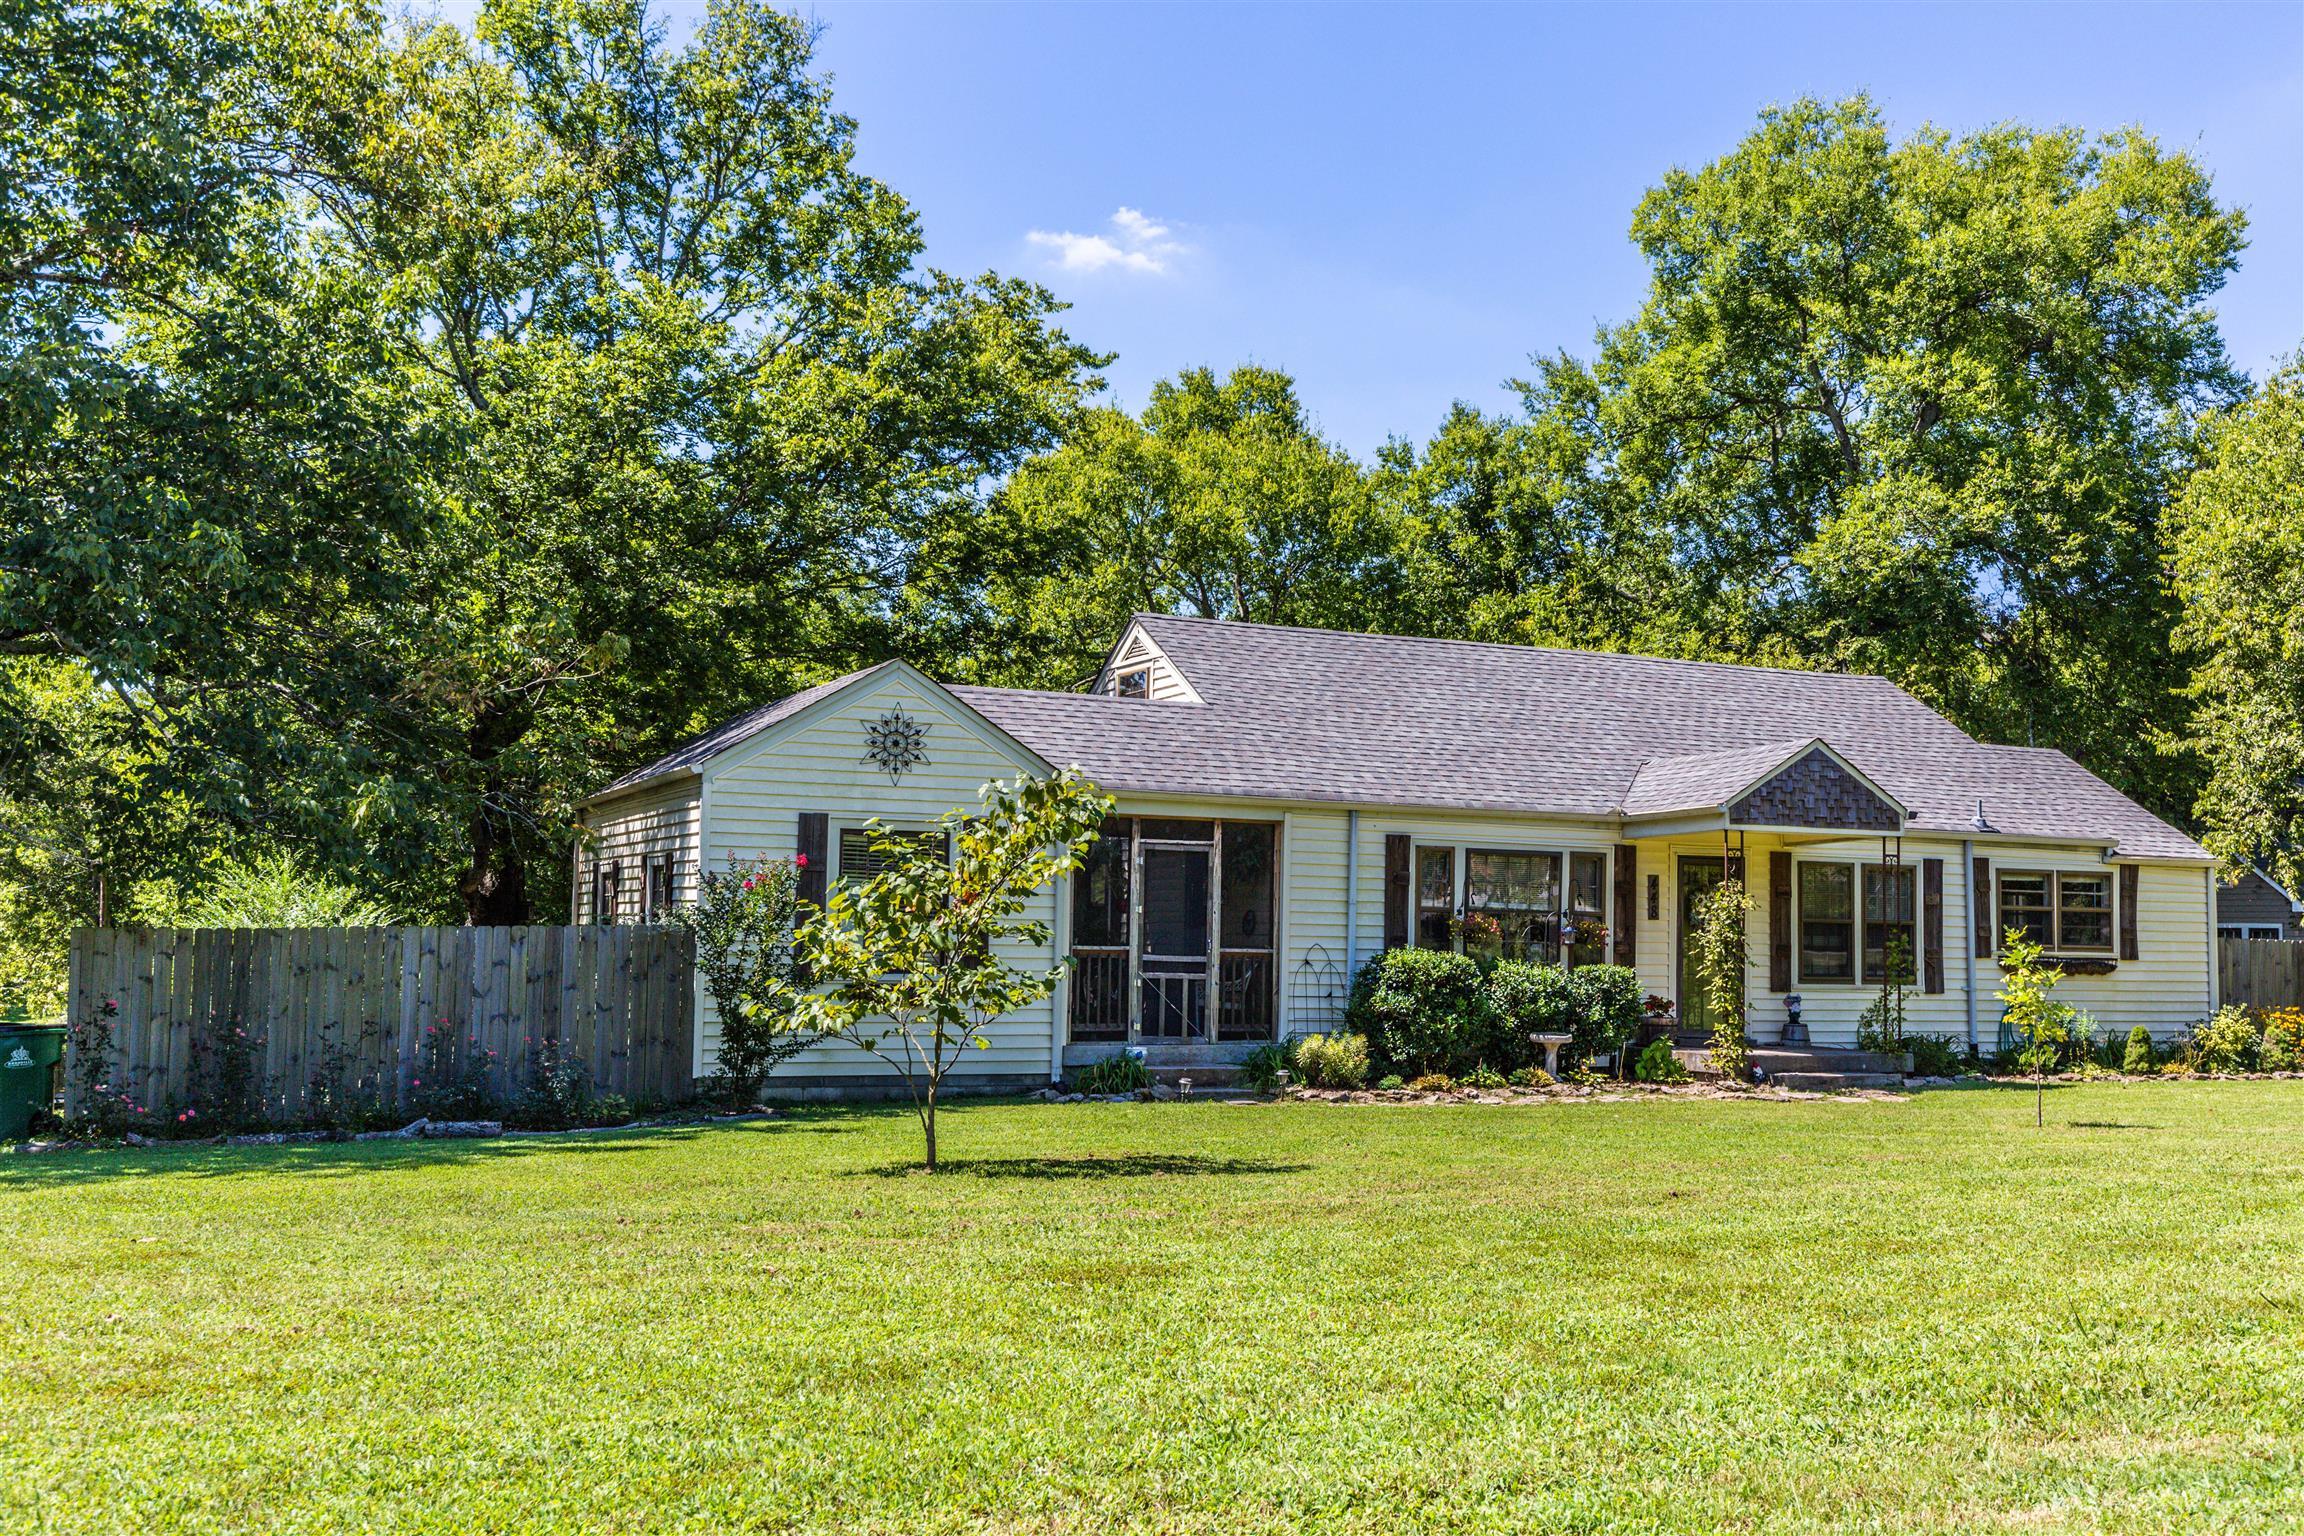 448 E Due West Ave, Madison, TN 37115 - Madison, TN real estate listing